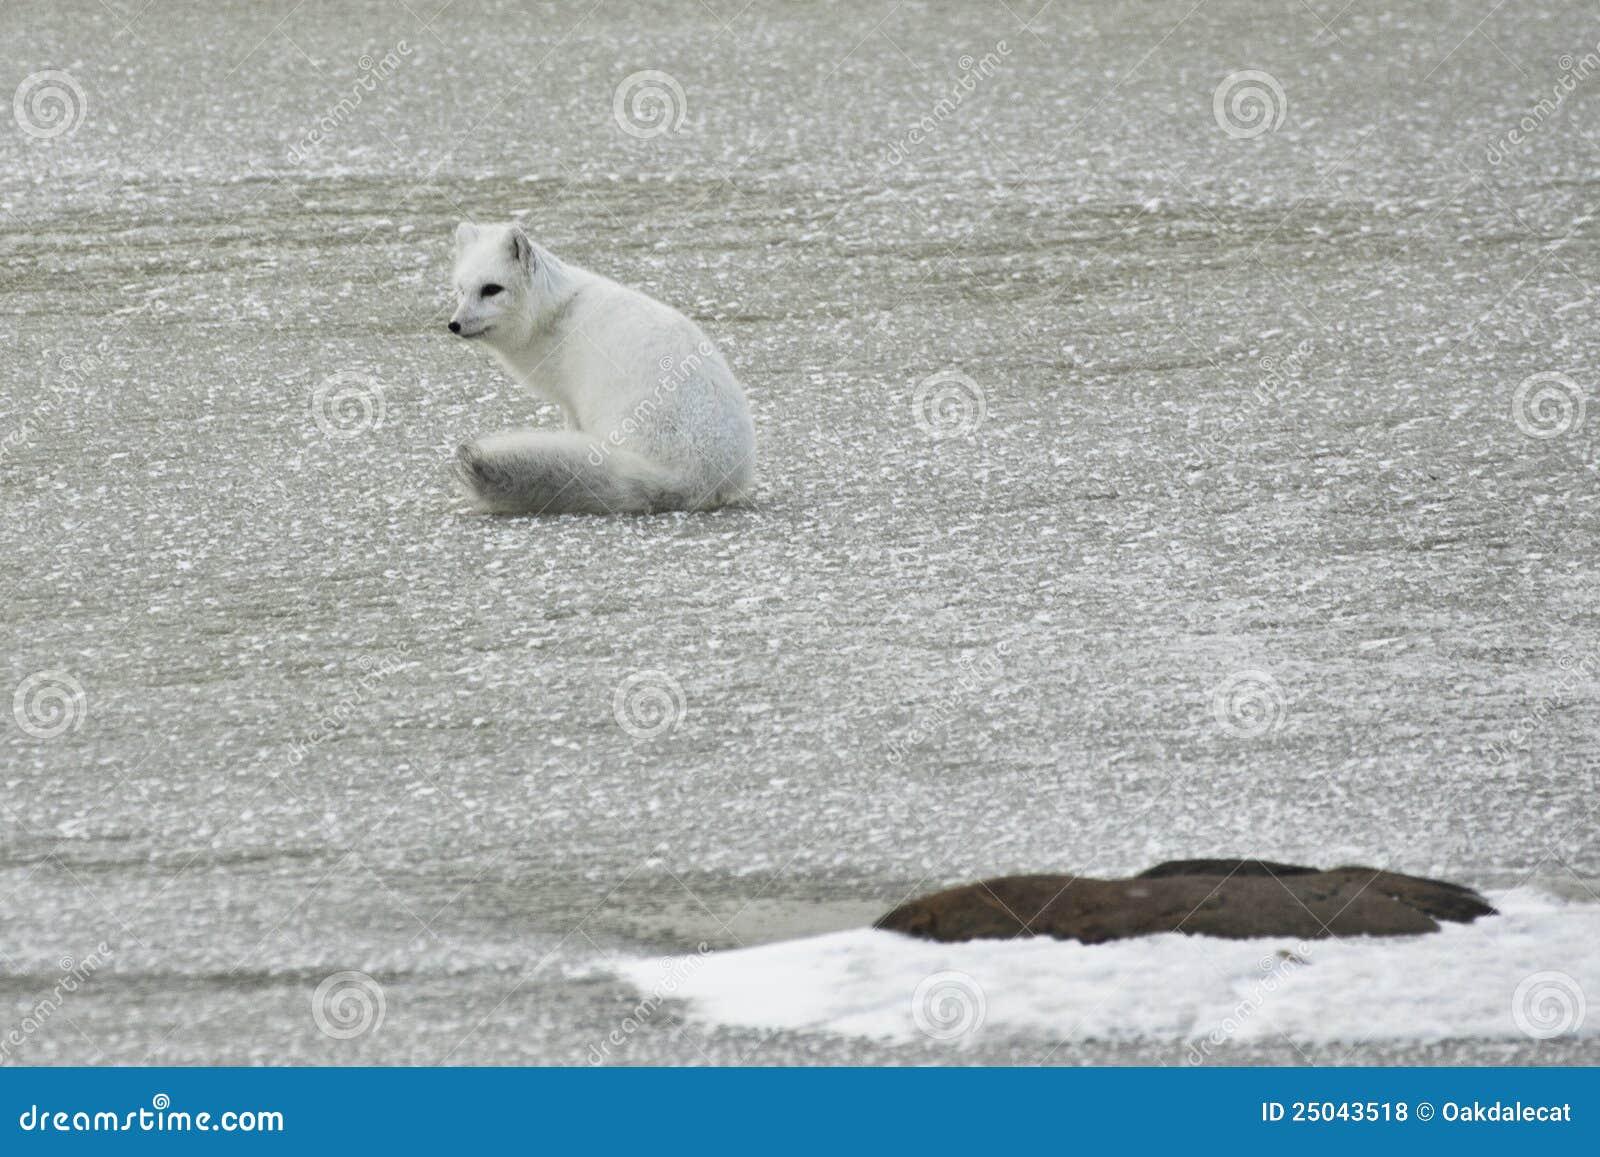 White Arctic Fox Sitting on Ice